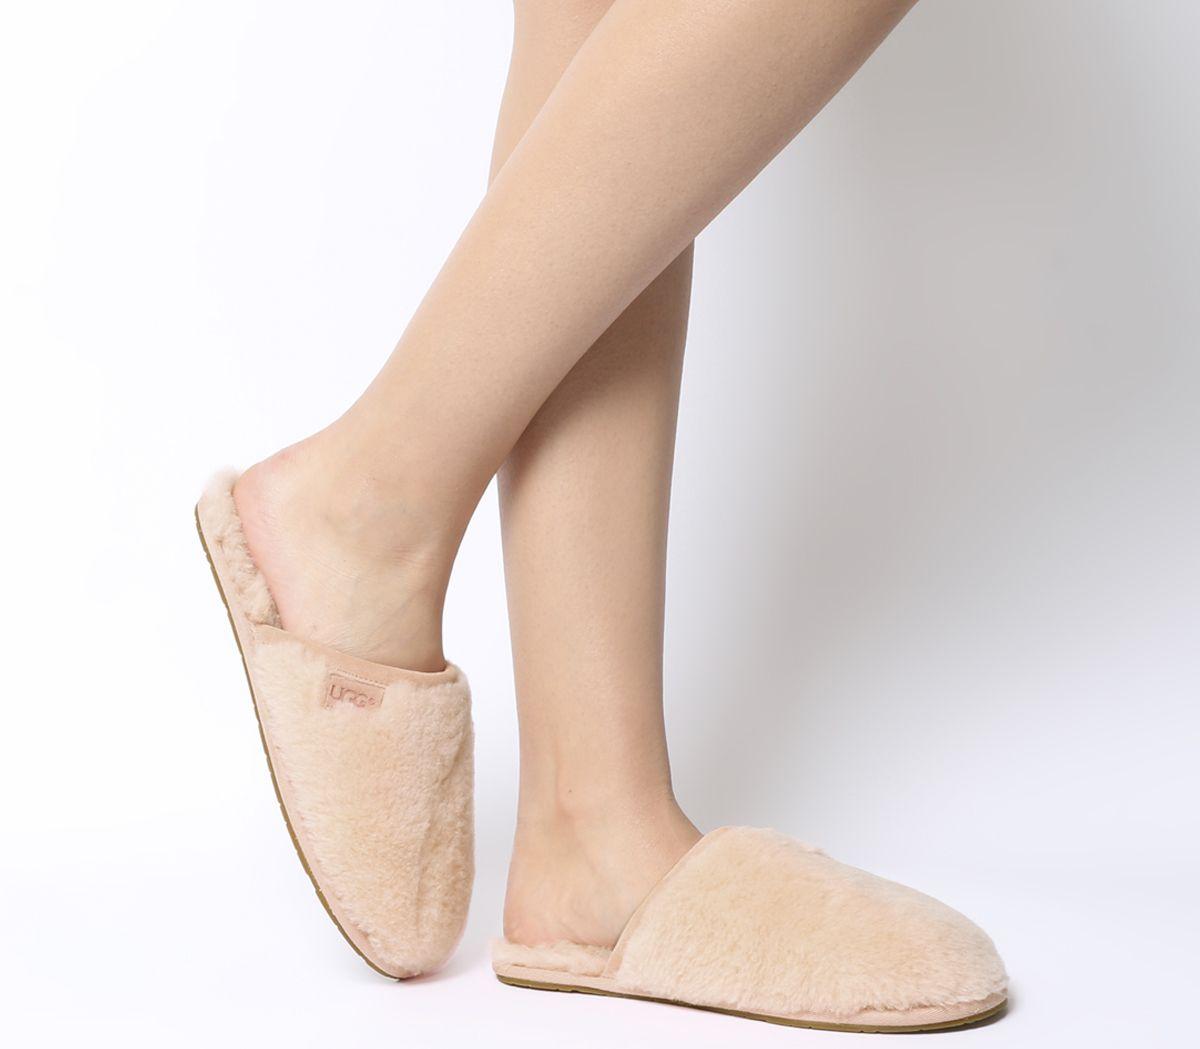 96bdd3673ce Fluffette Slippers